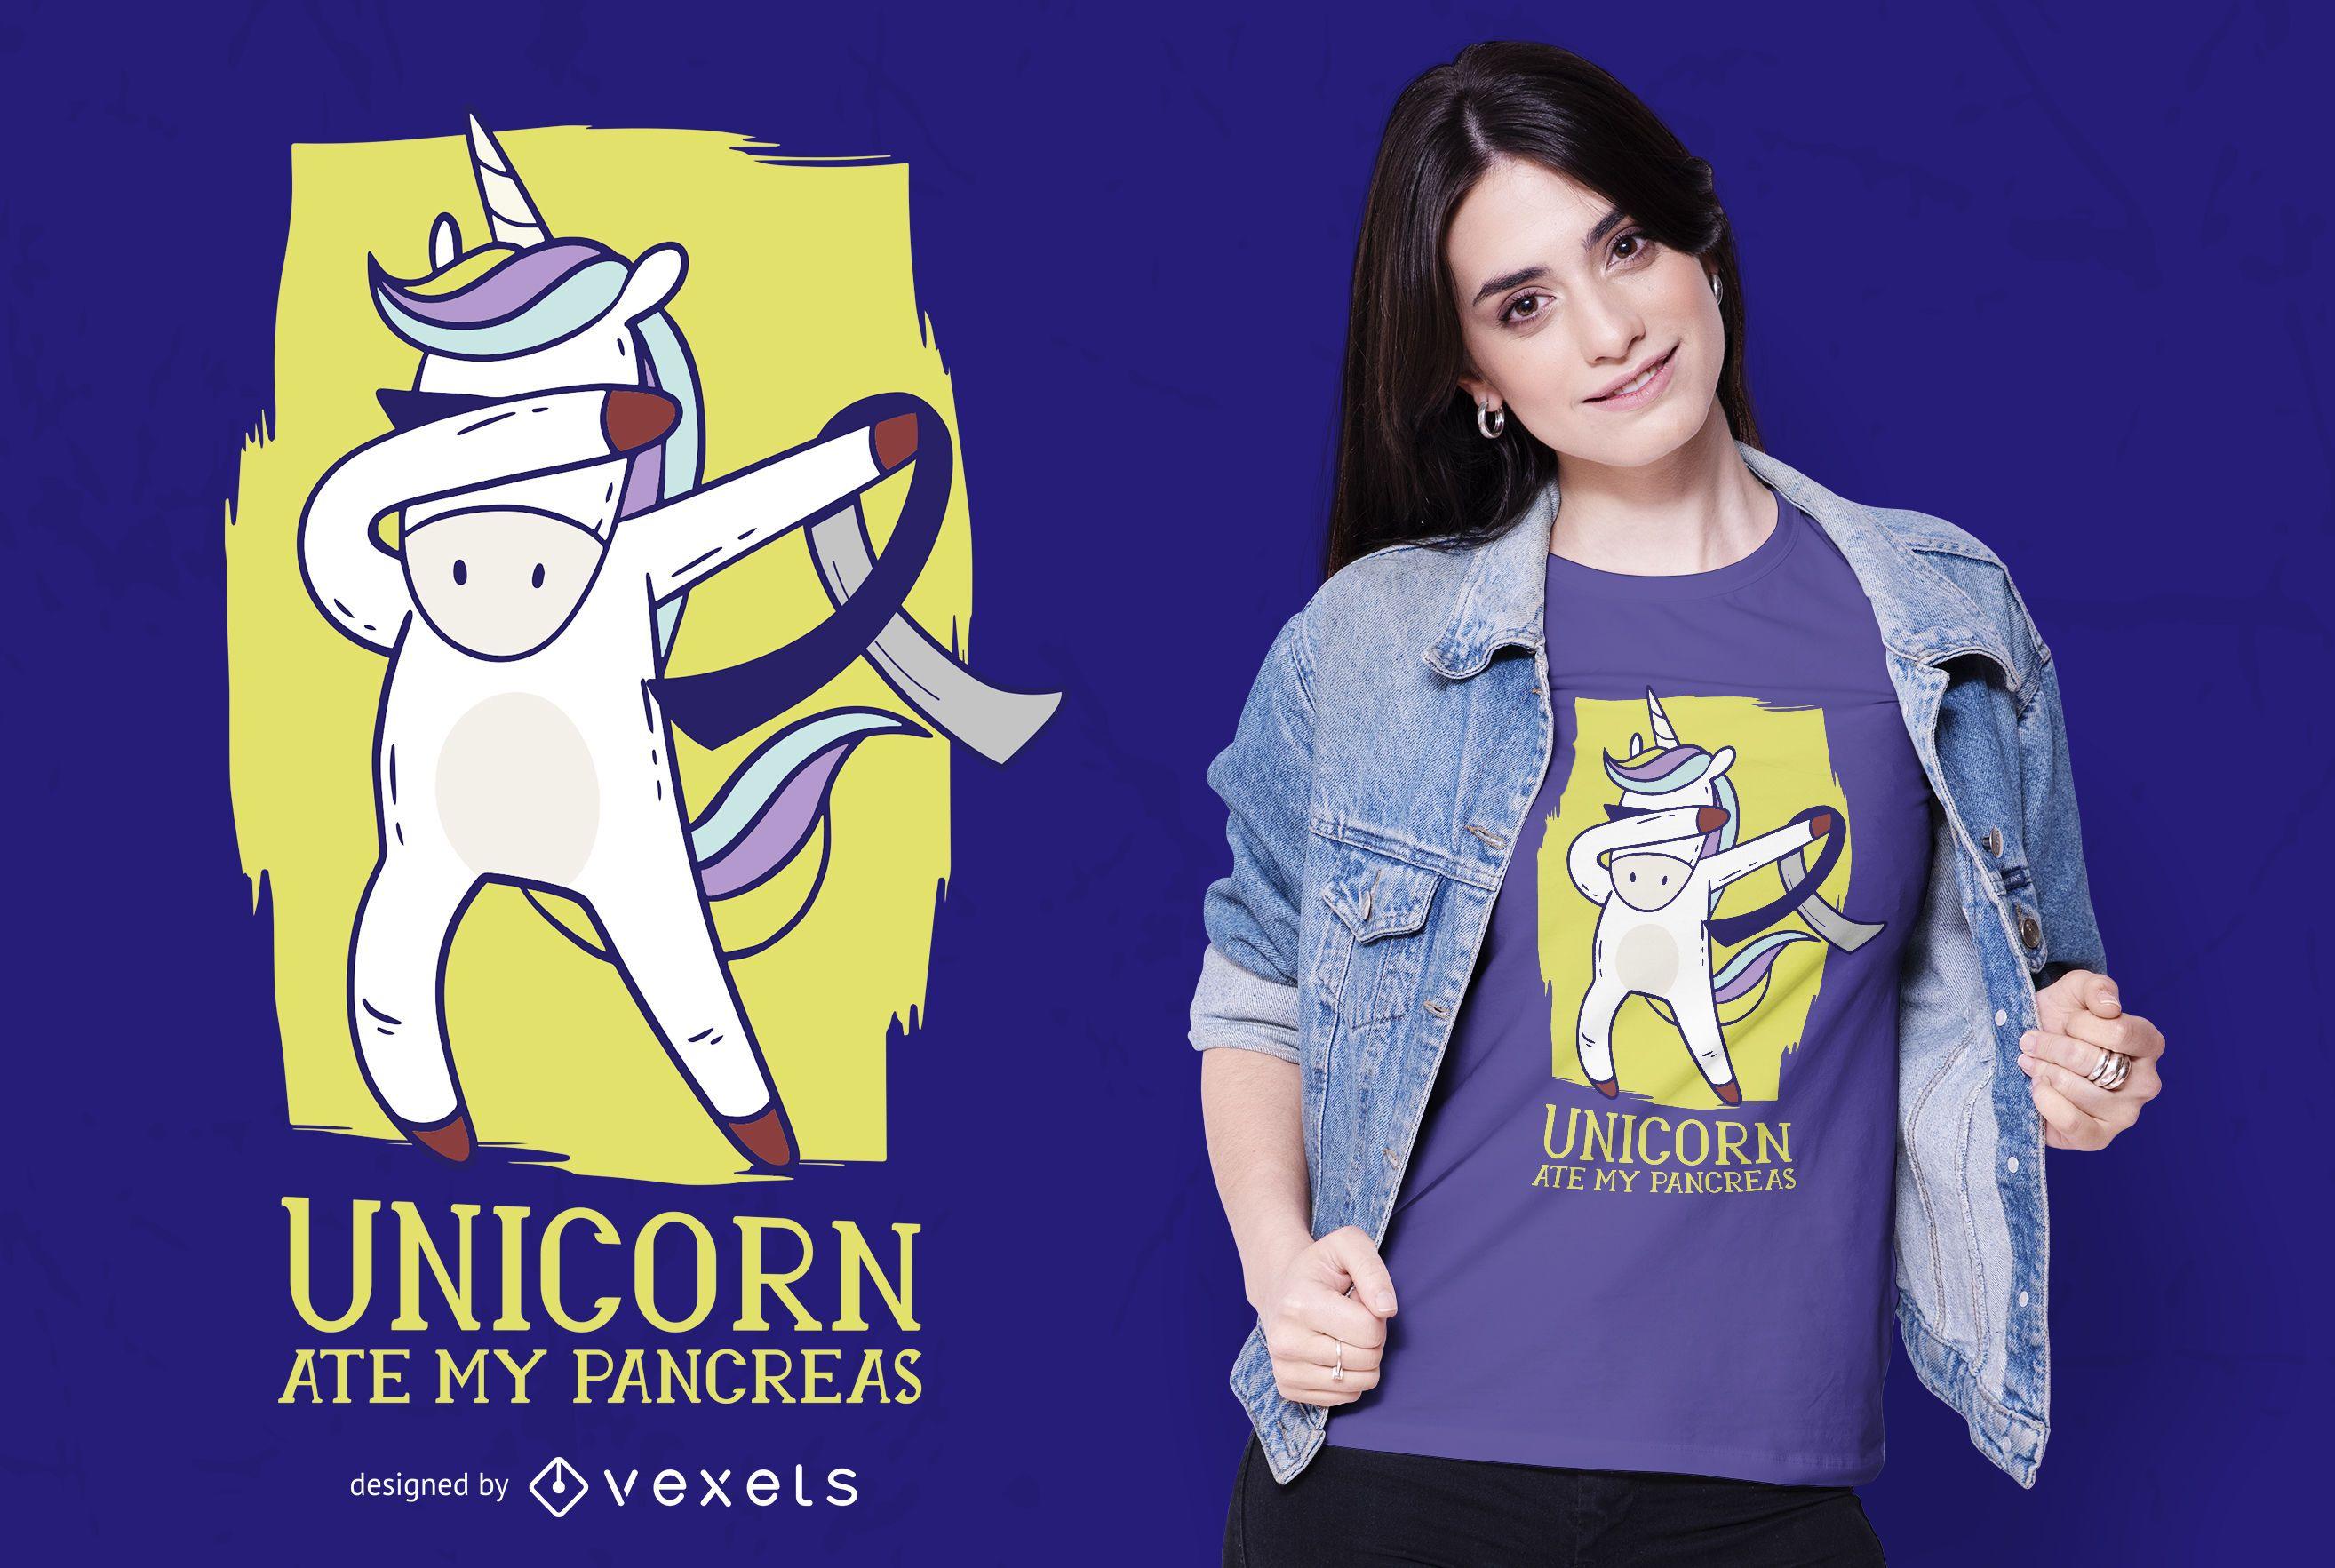 Unicorn pancreas t-shirt design